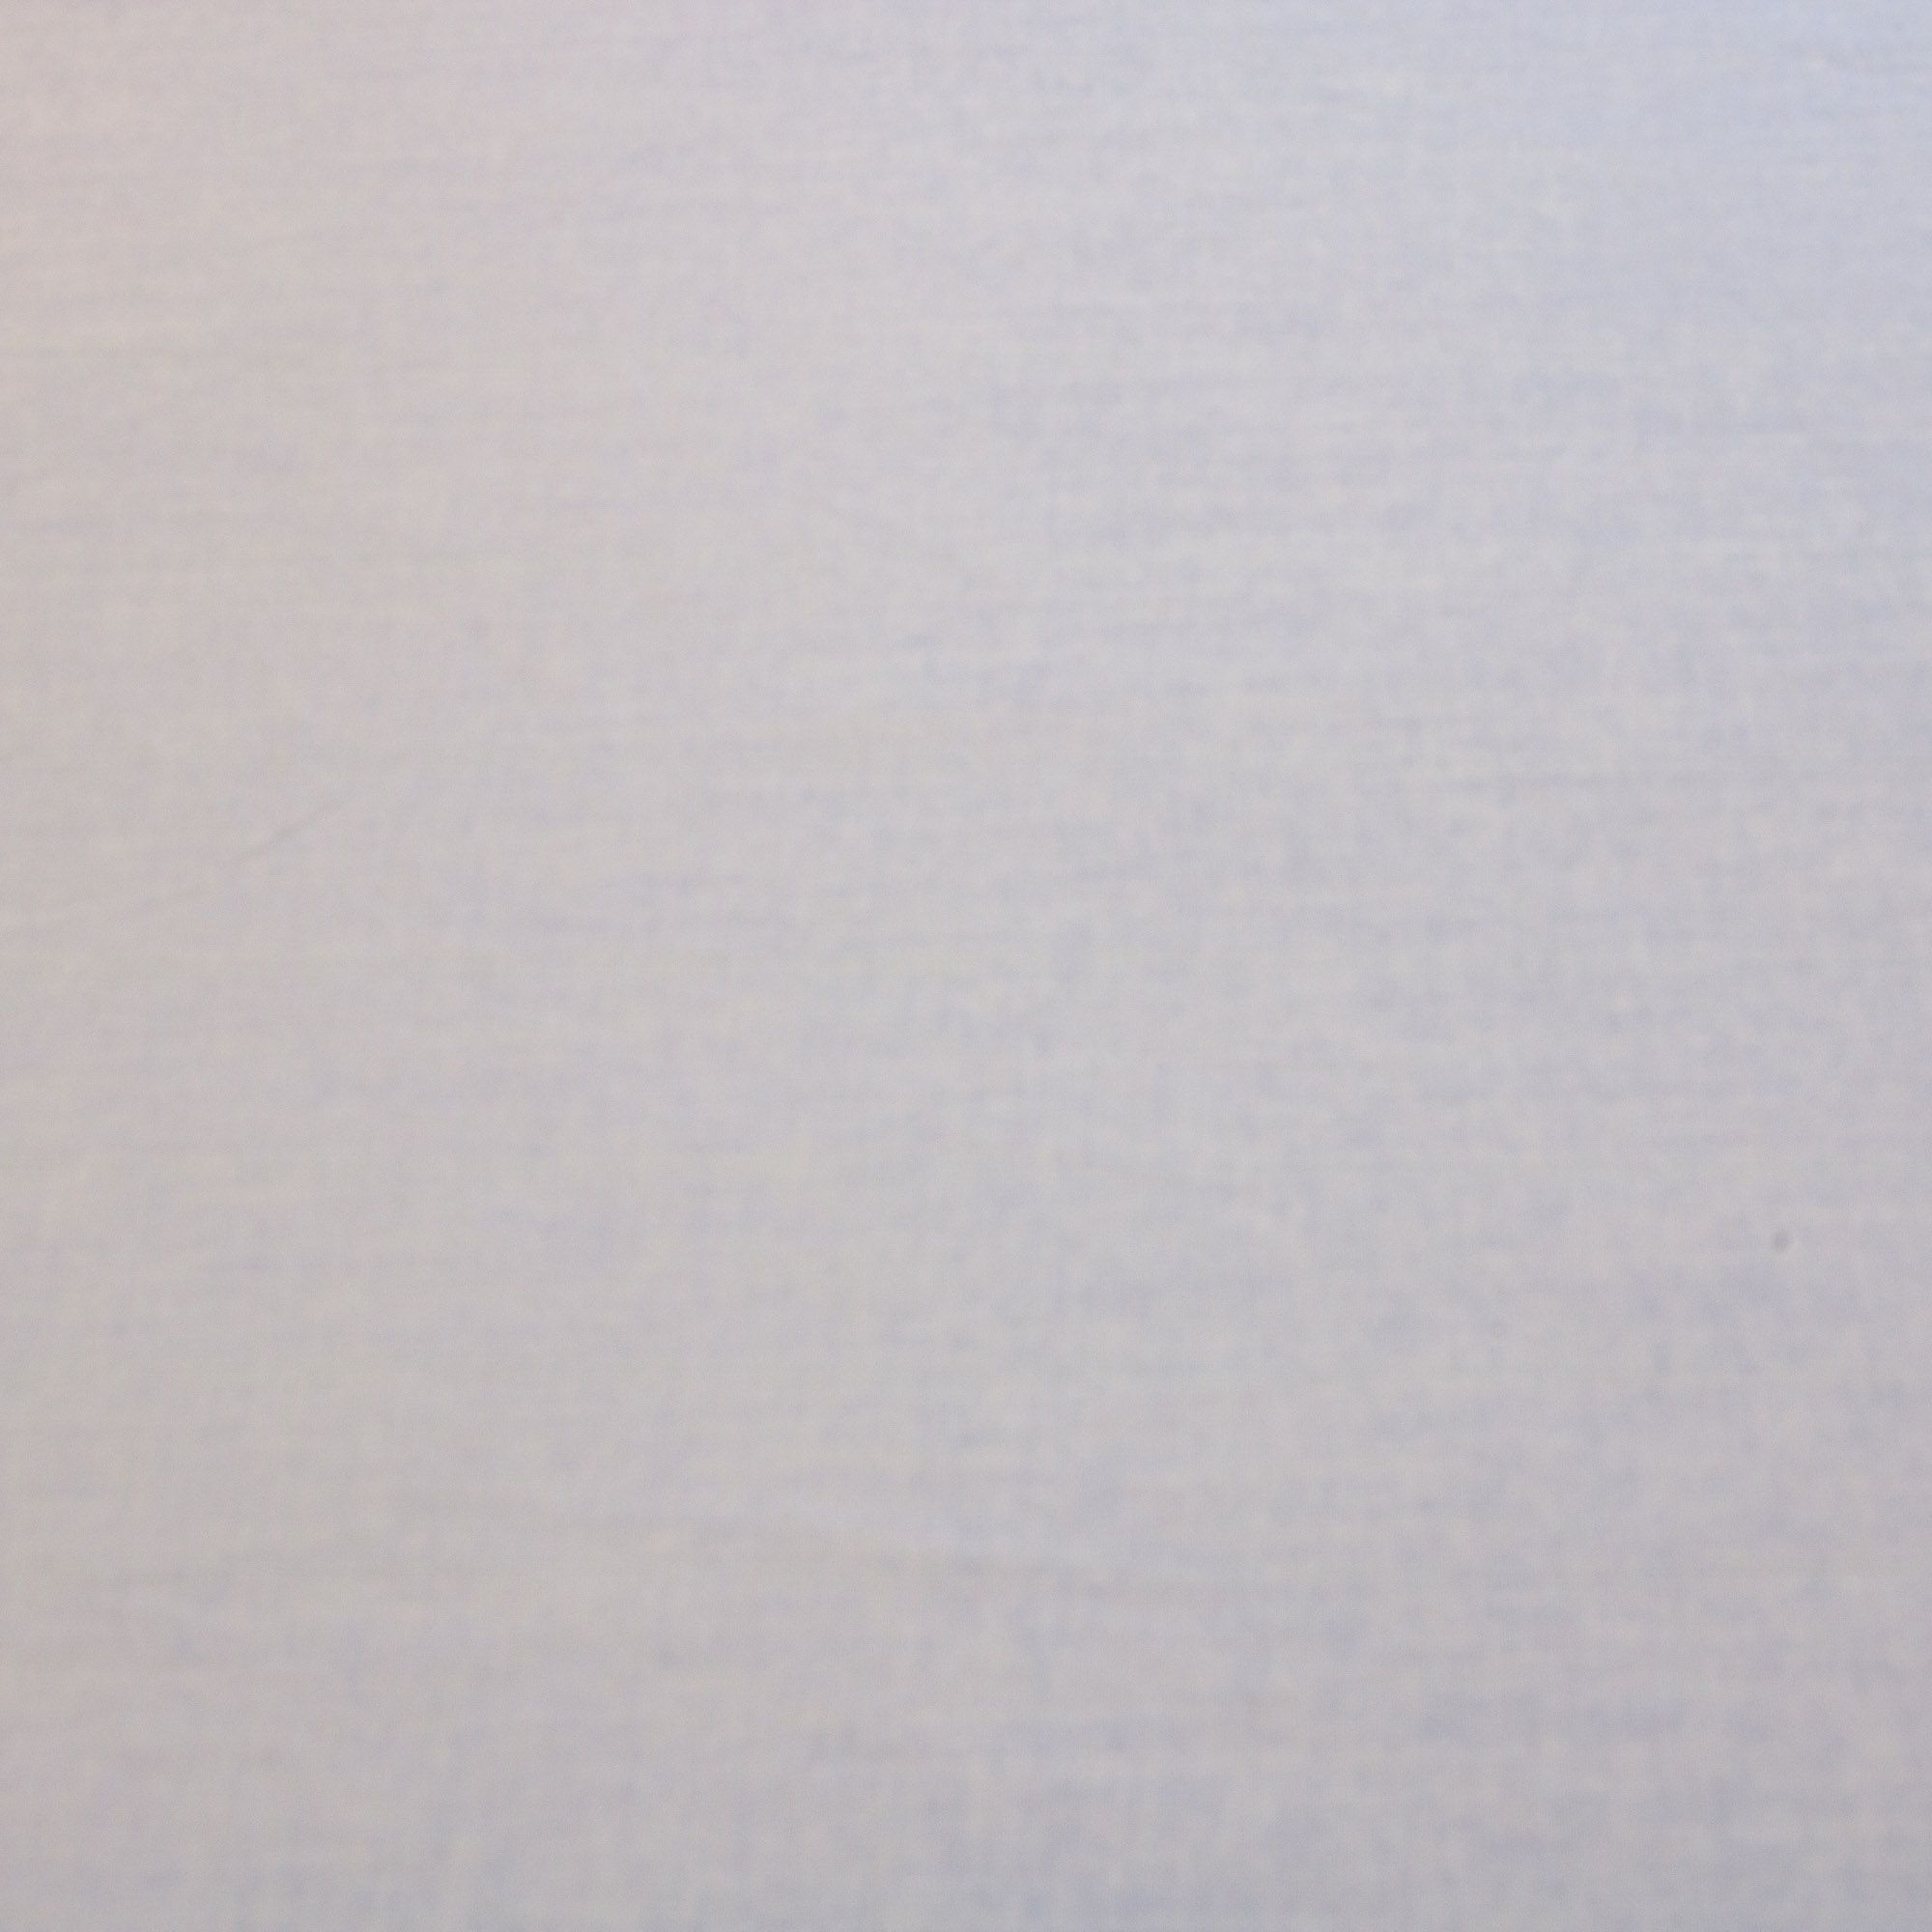 Tecido Cambraia Azul Claro 100% Algodao 1,40 m Largura